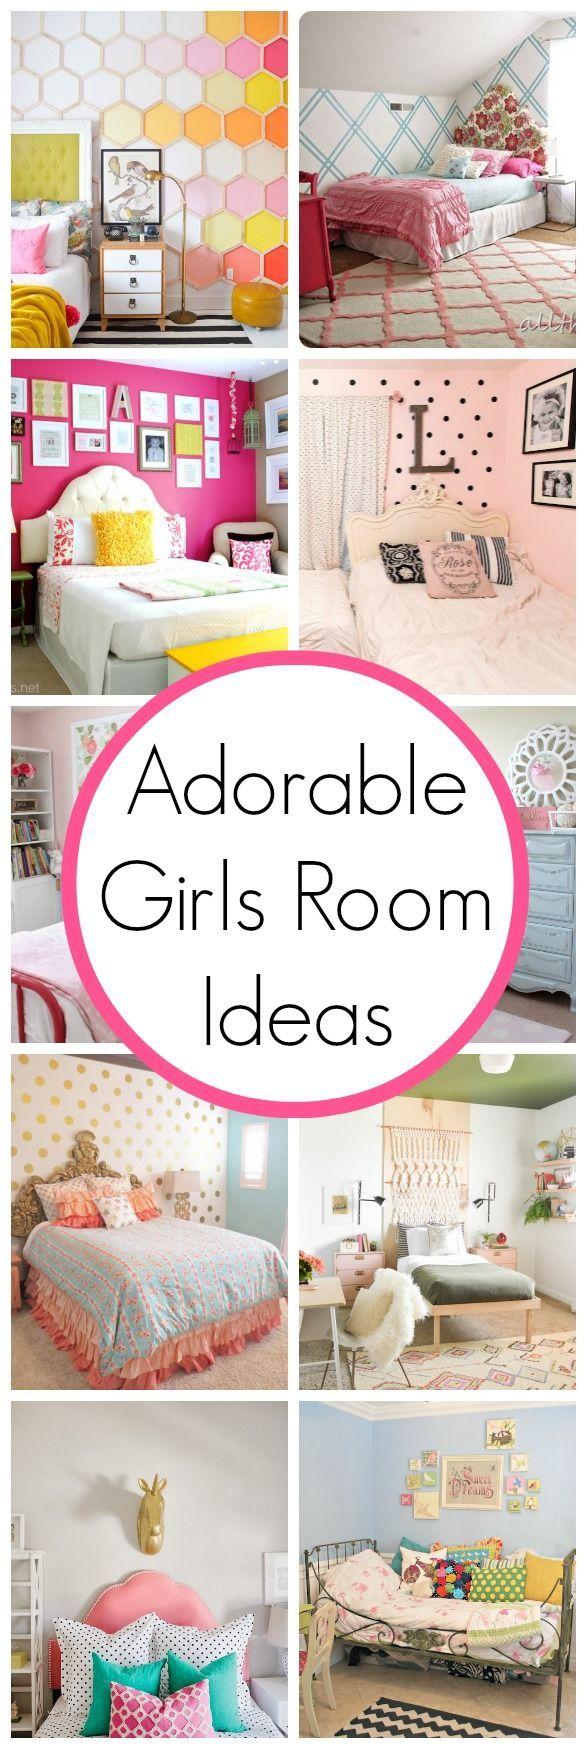 116 best Inspiring Kids Spaces images on Pinterest | Bedroom ...